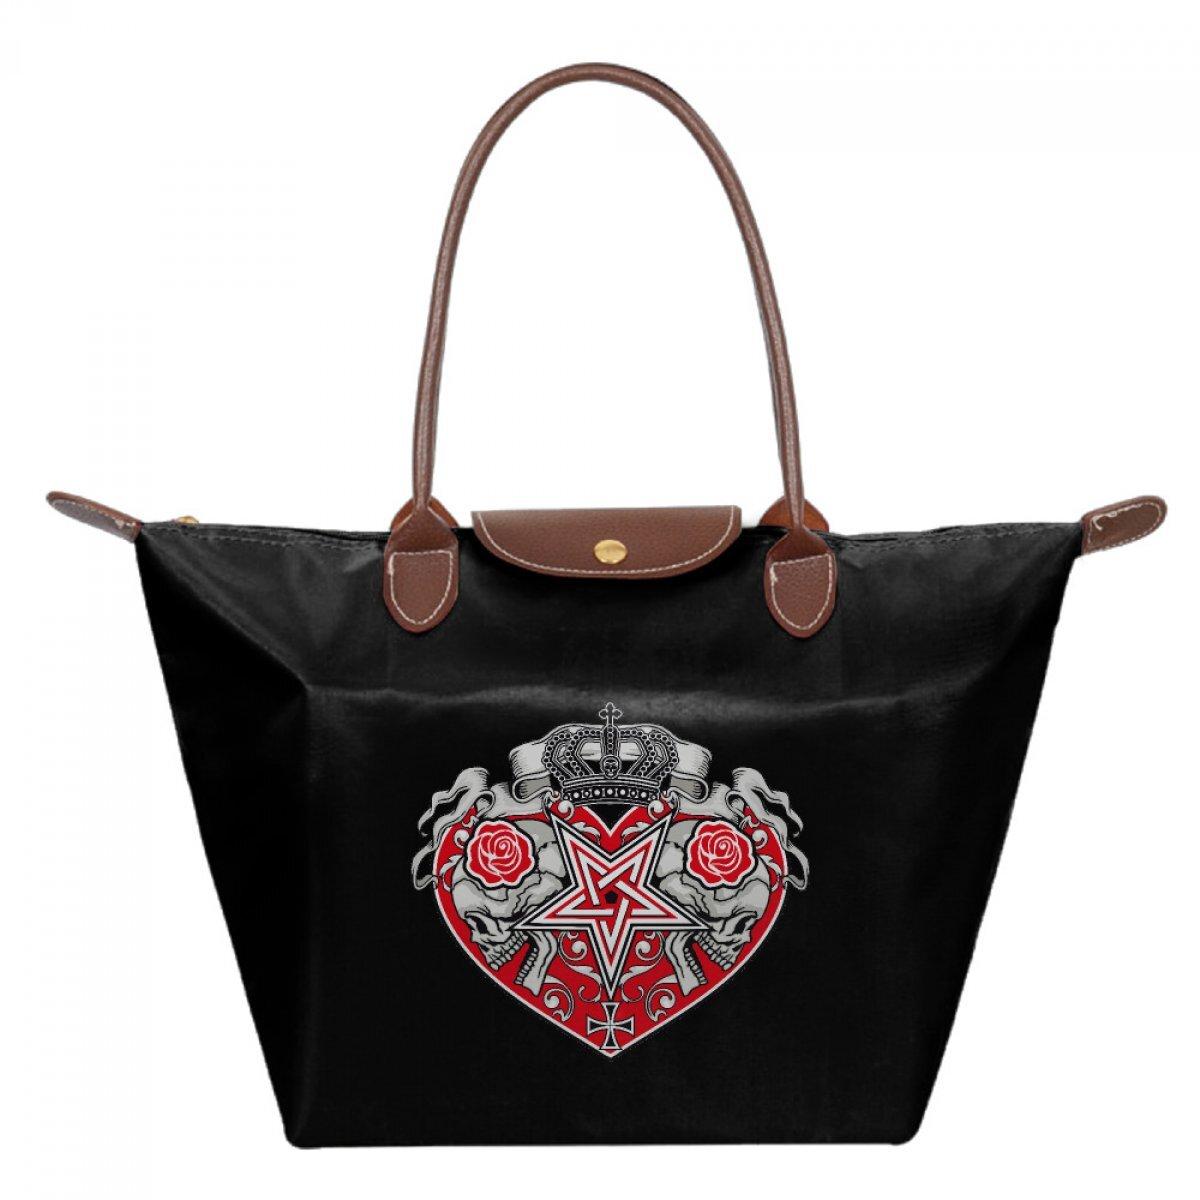 PhoRock Women Handbag Big Eyes Printed  Hobo Bag JZKL002 0